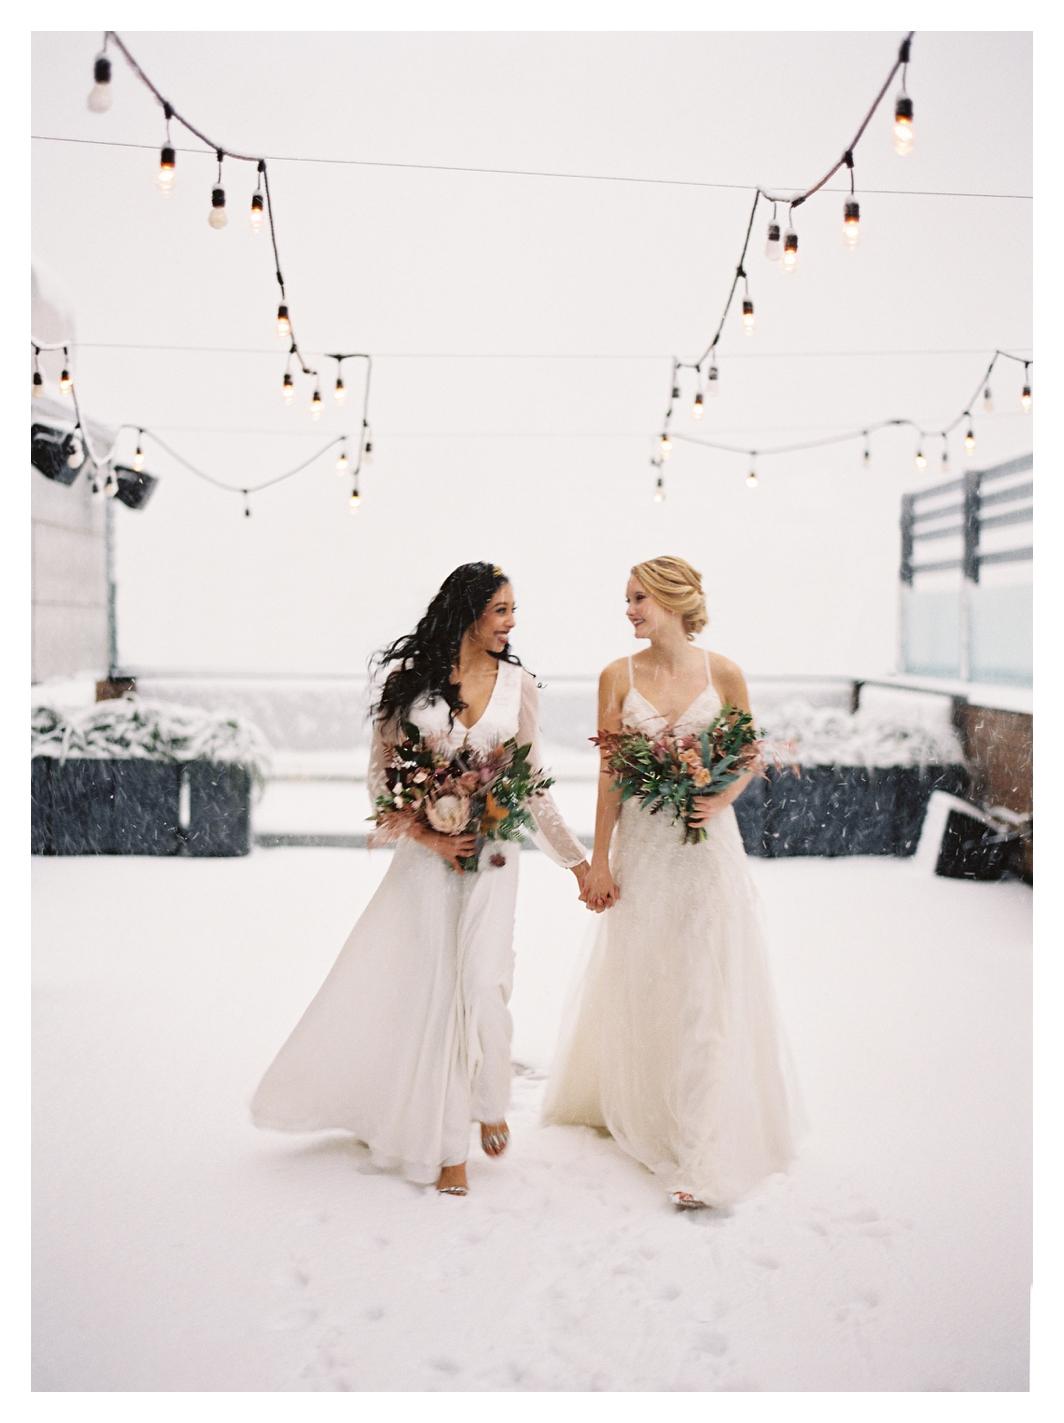 winter wedding, snow wedding, two brides